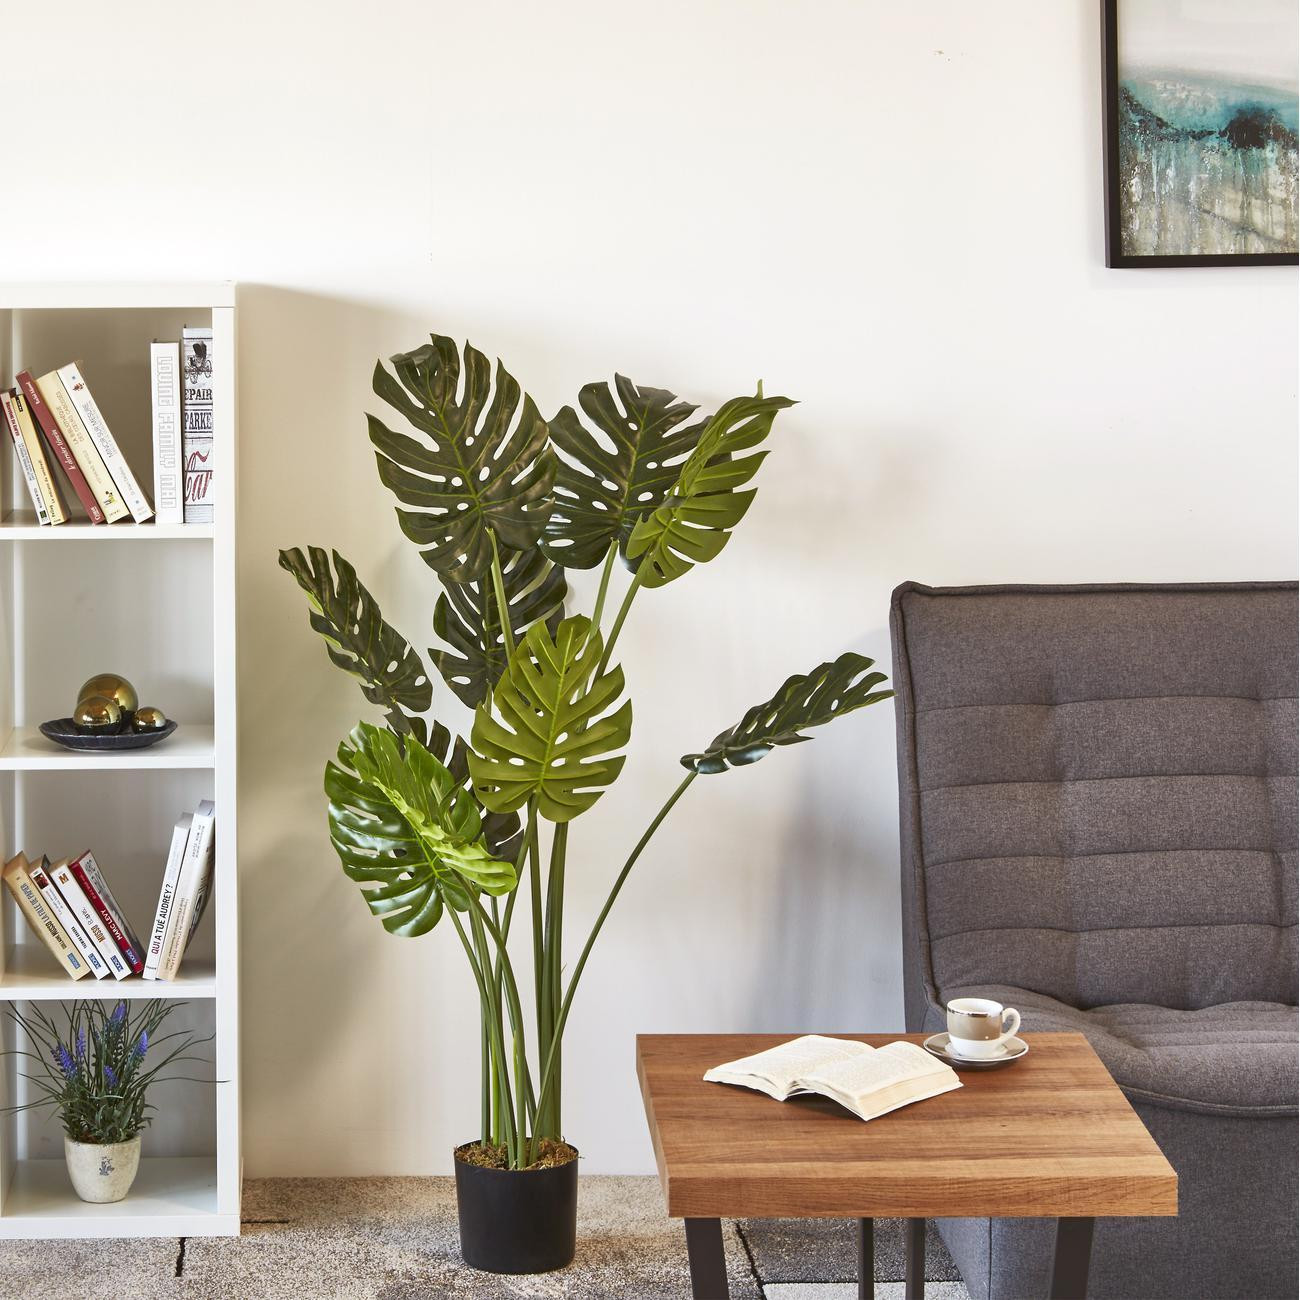 Plante artificielle OLLA 10 feuilles